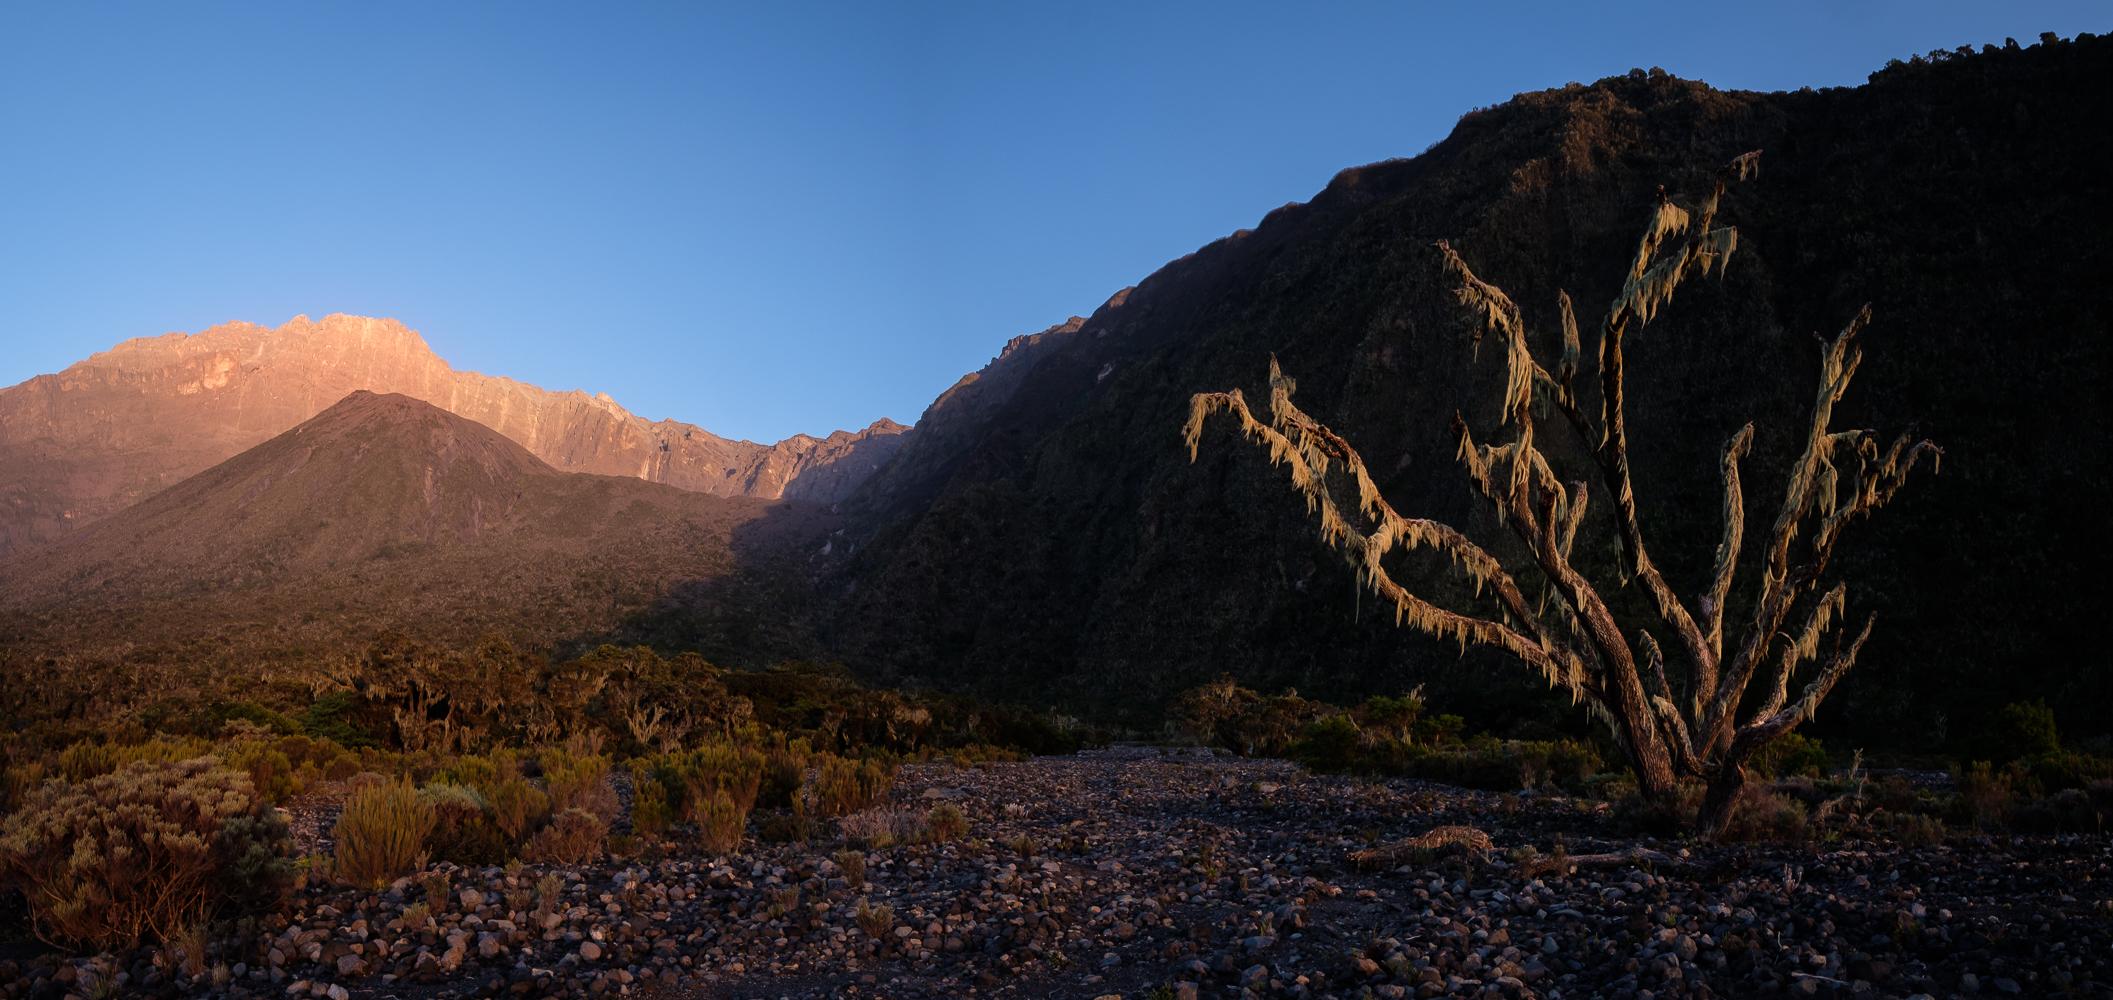 Morning light in Meru's crater, Tanzania.